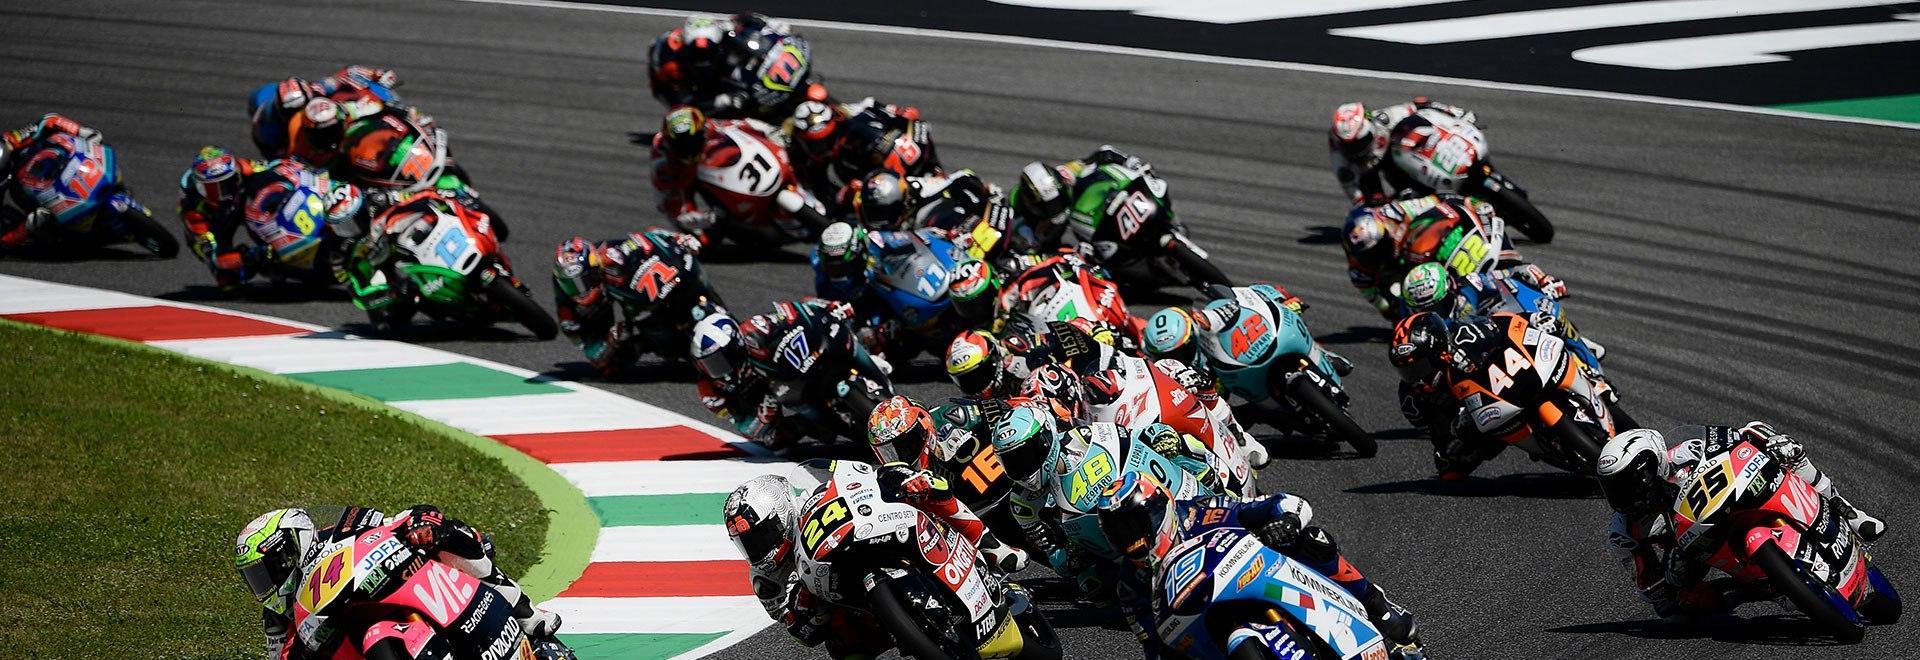 Superbike Vallelunga. Race 2